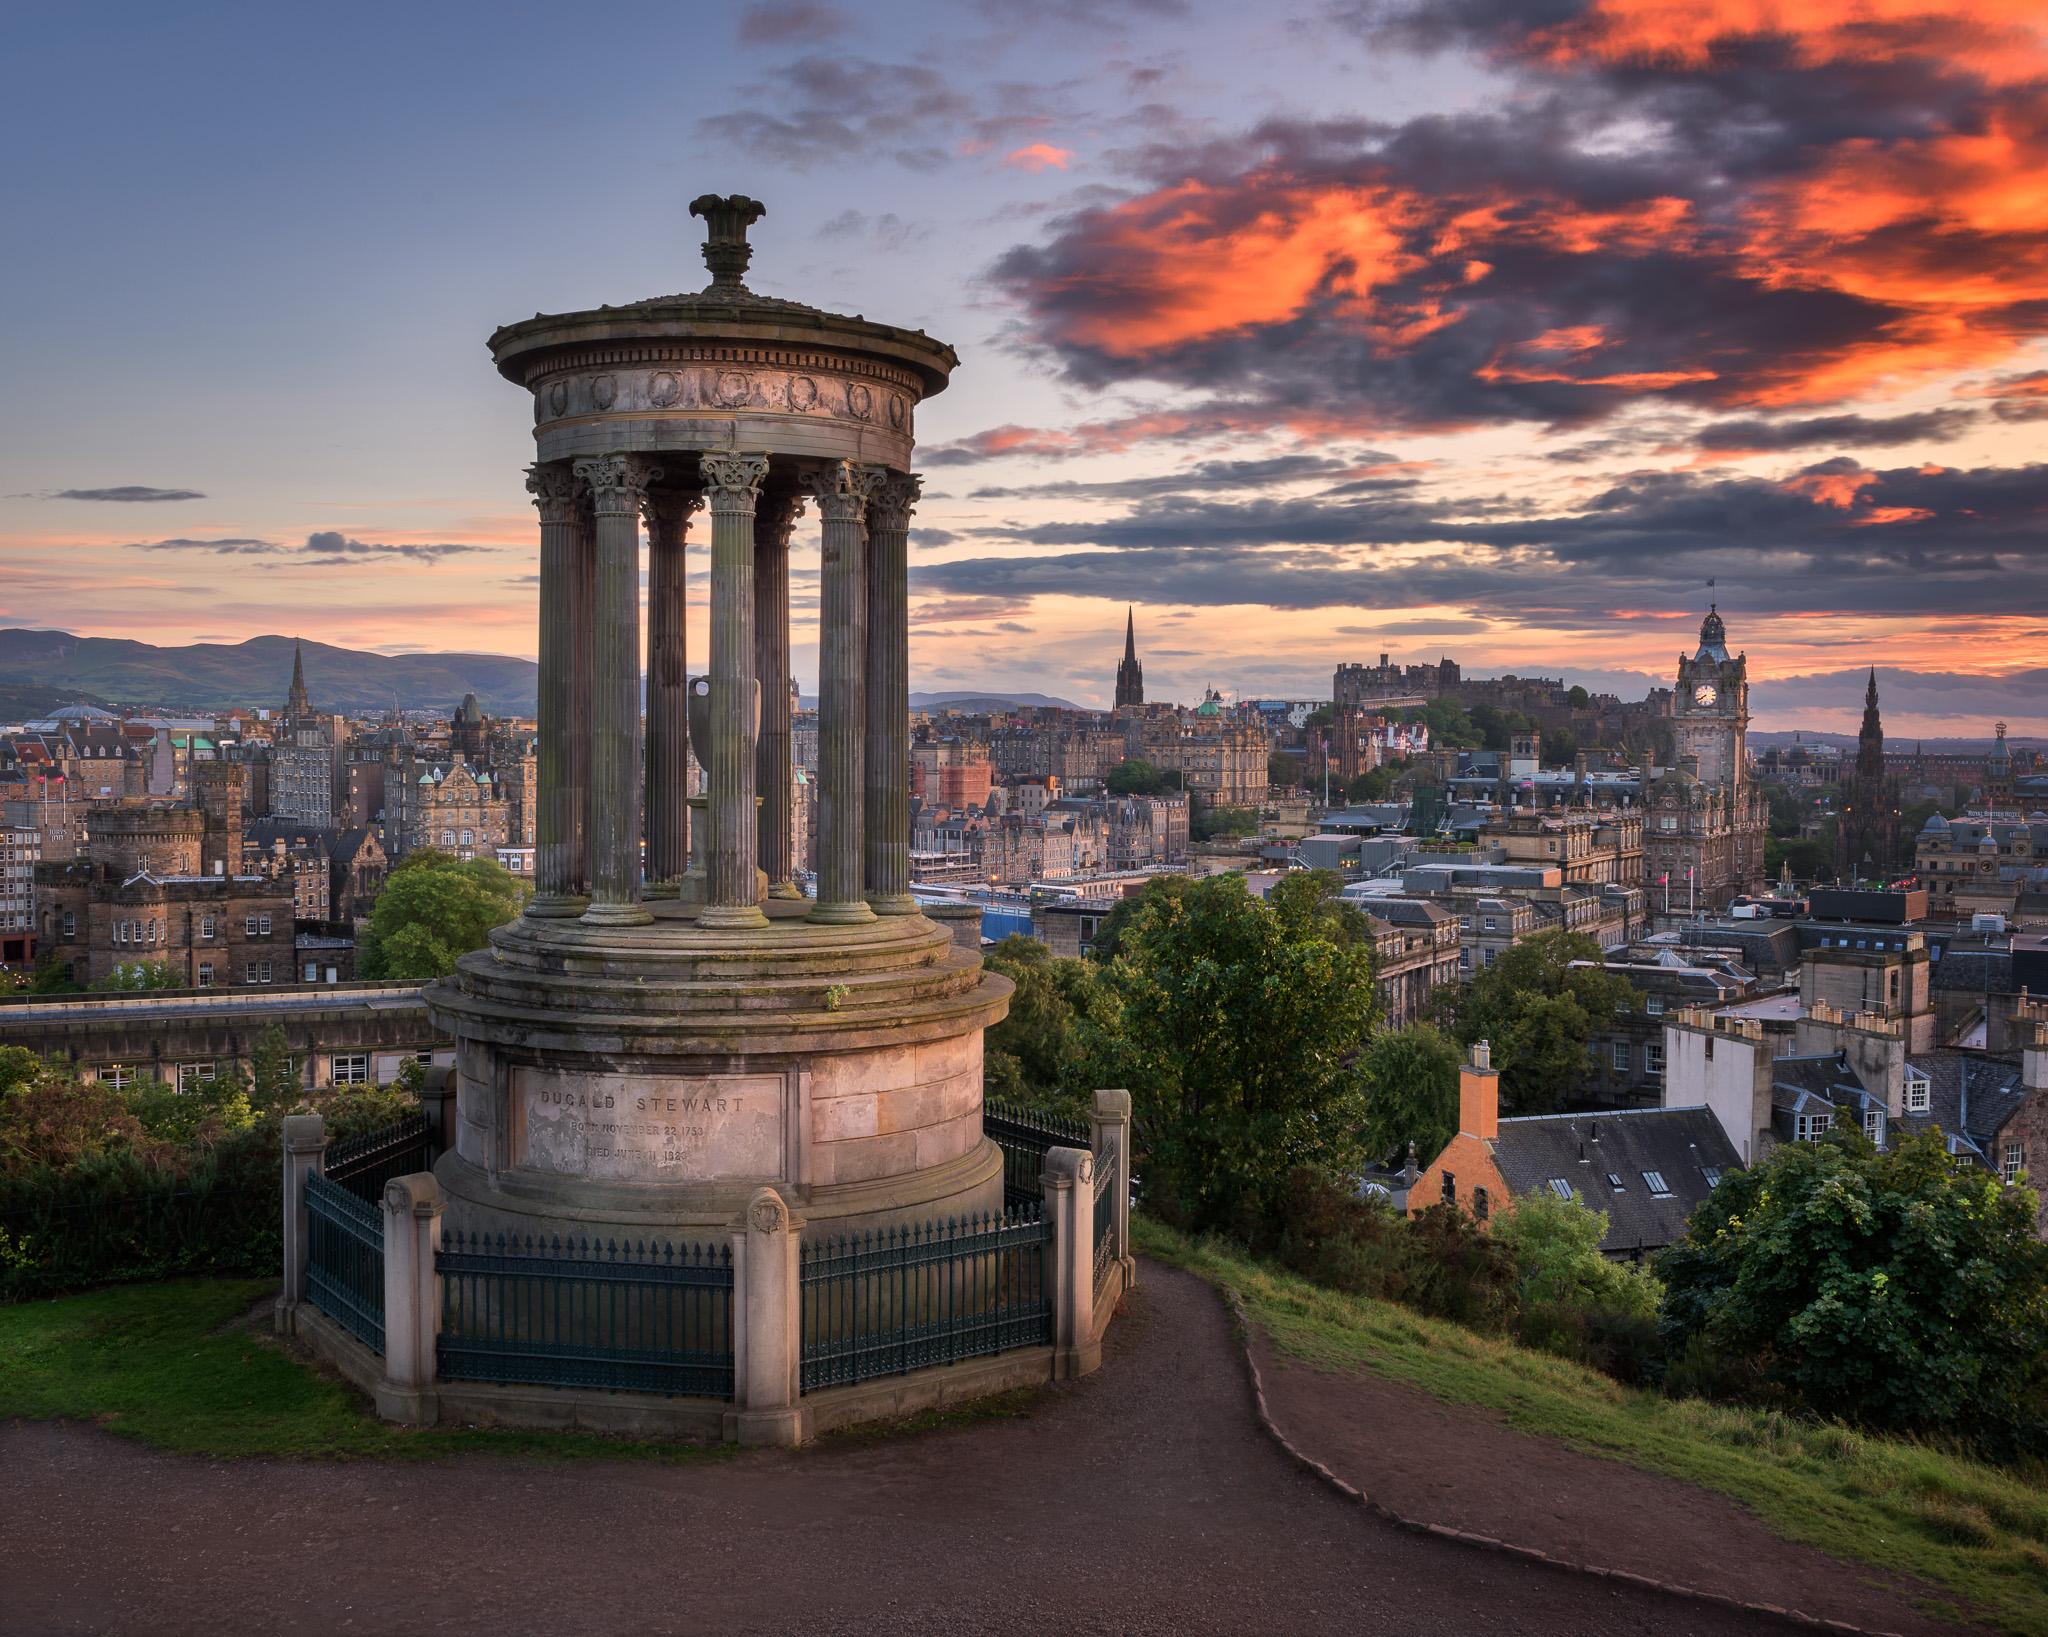 View of Edinburgh from Calton Hill, Scotland, UK, United Kingdom